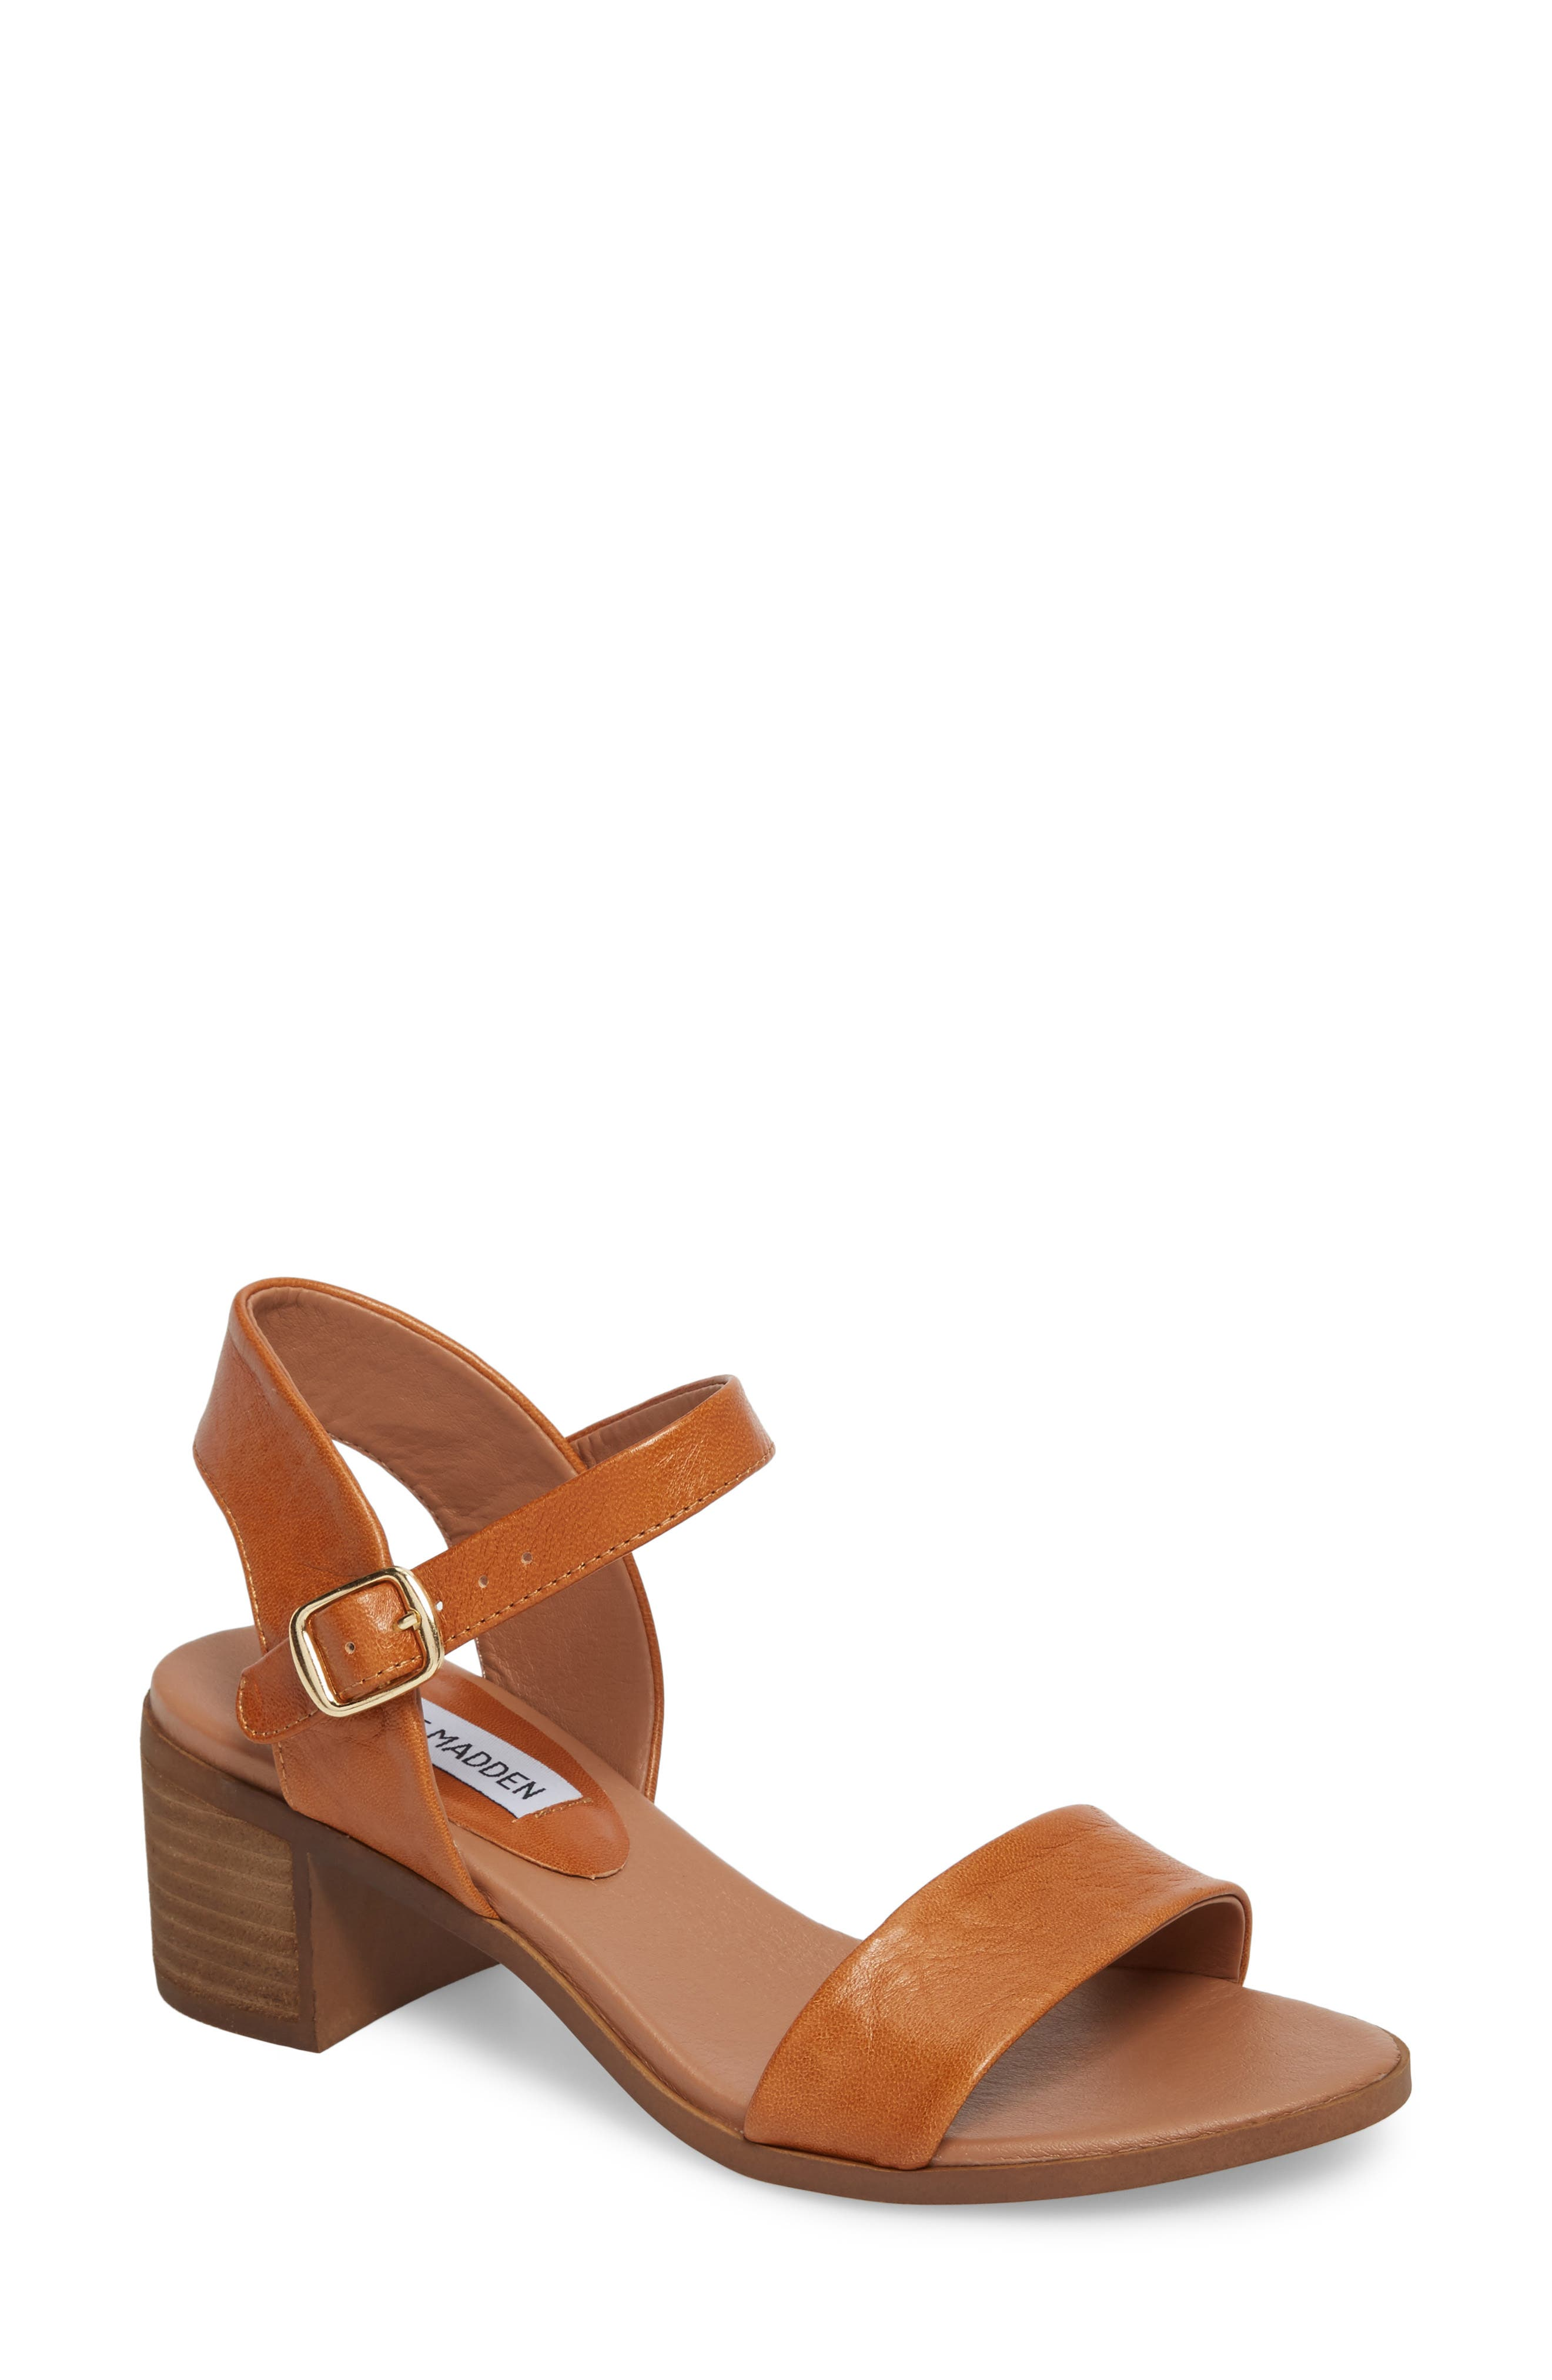 cca21f09861 Steve Madden April Block Heel Sandal